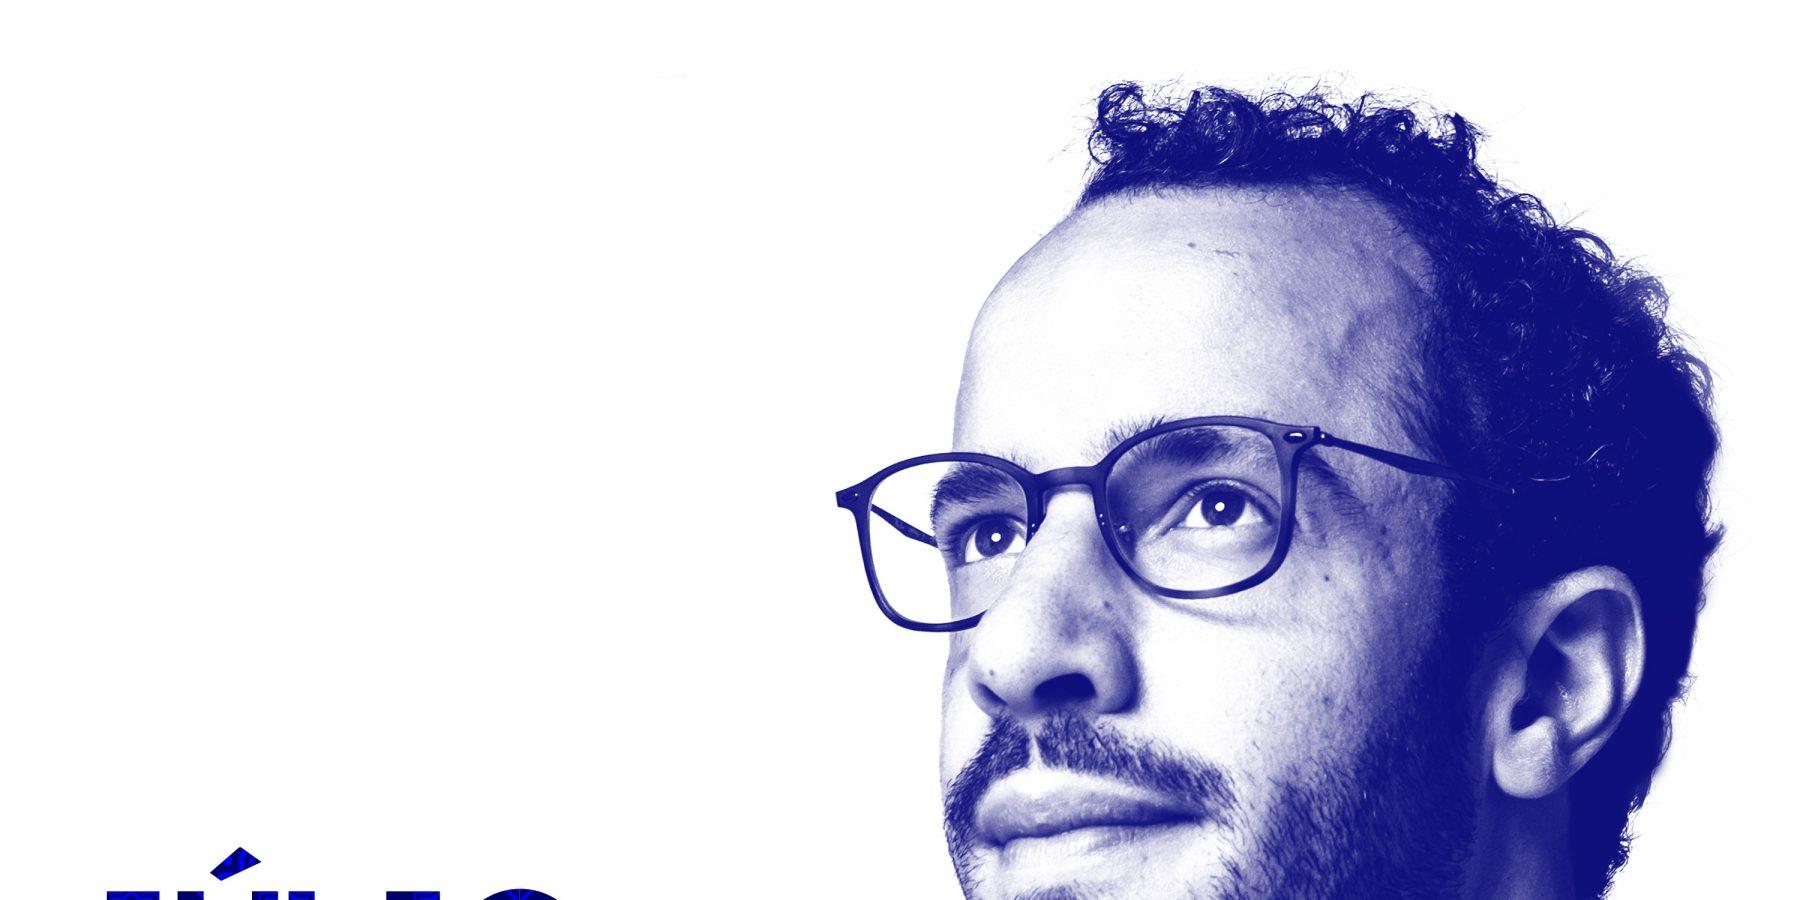 Julio Resende - Lisbonhood - capa single